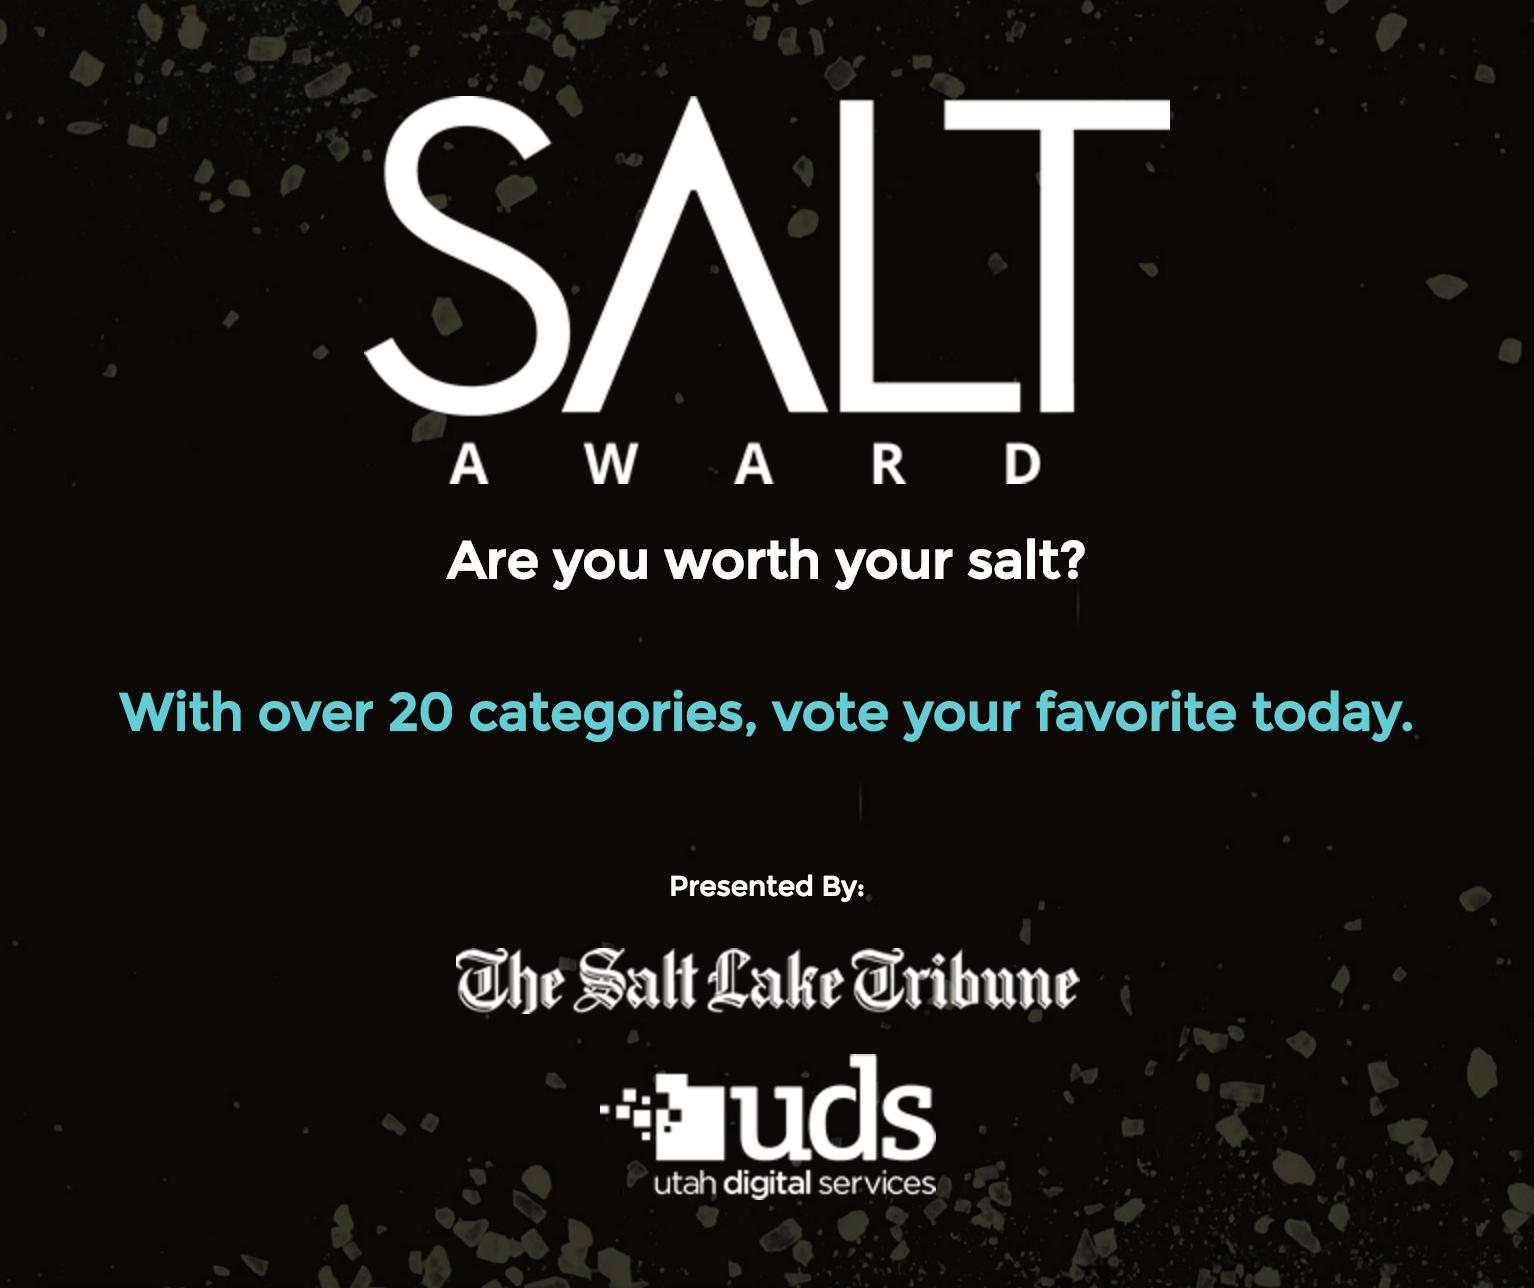 salt lake tribune salt awards